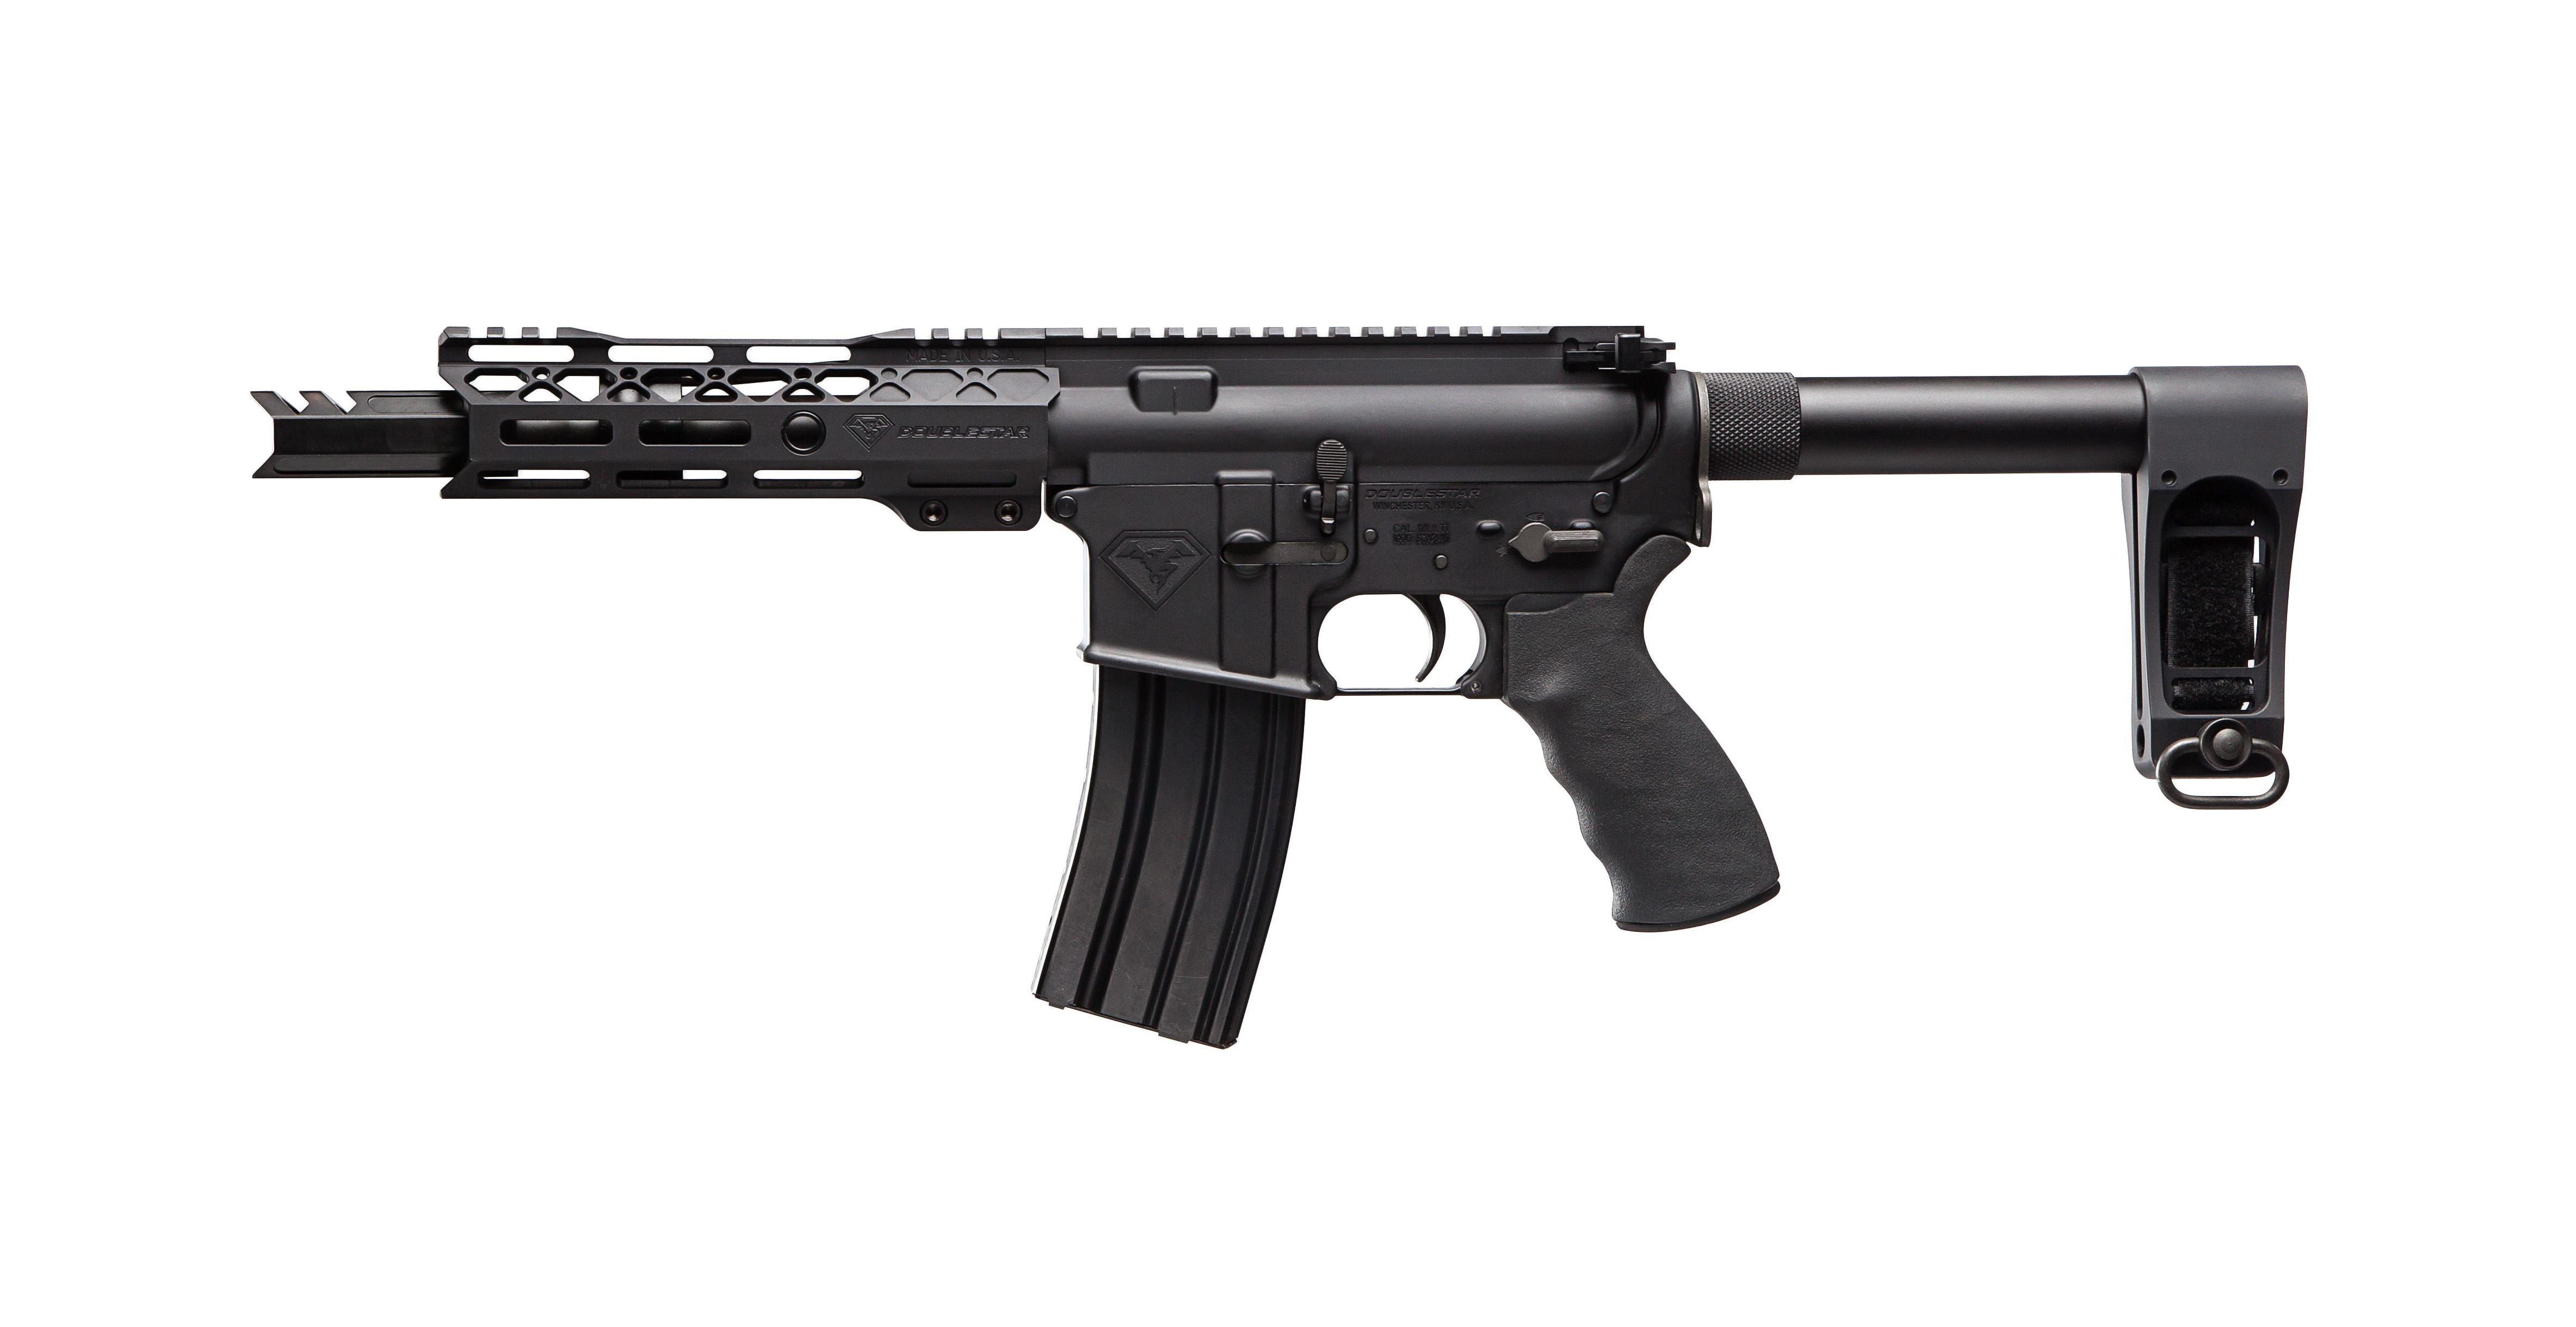 DoubleStar Debuts new AR-style Pistol: the ARP7 Pistol